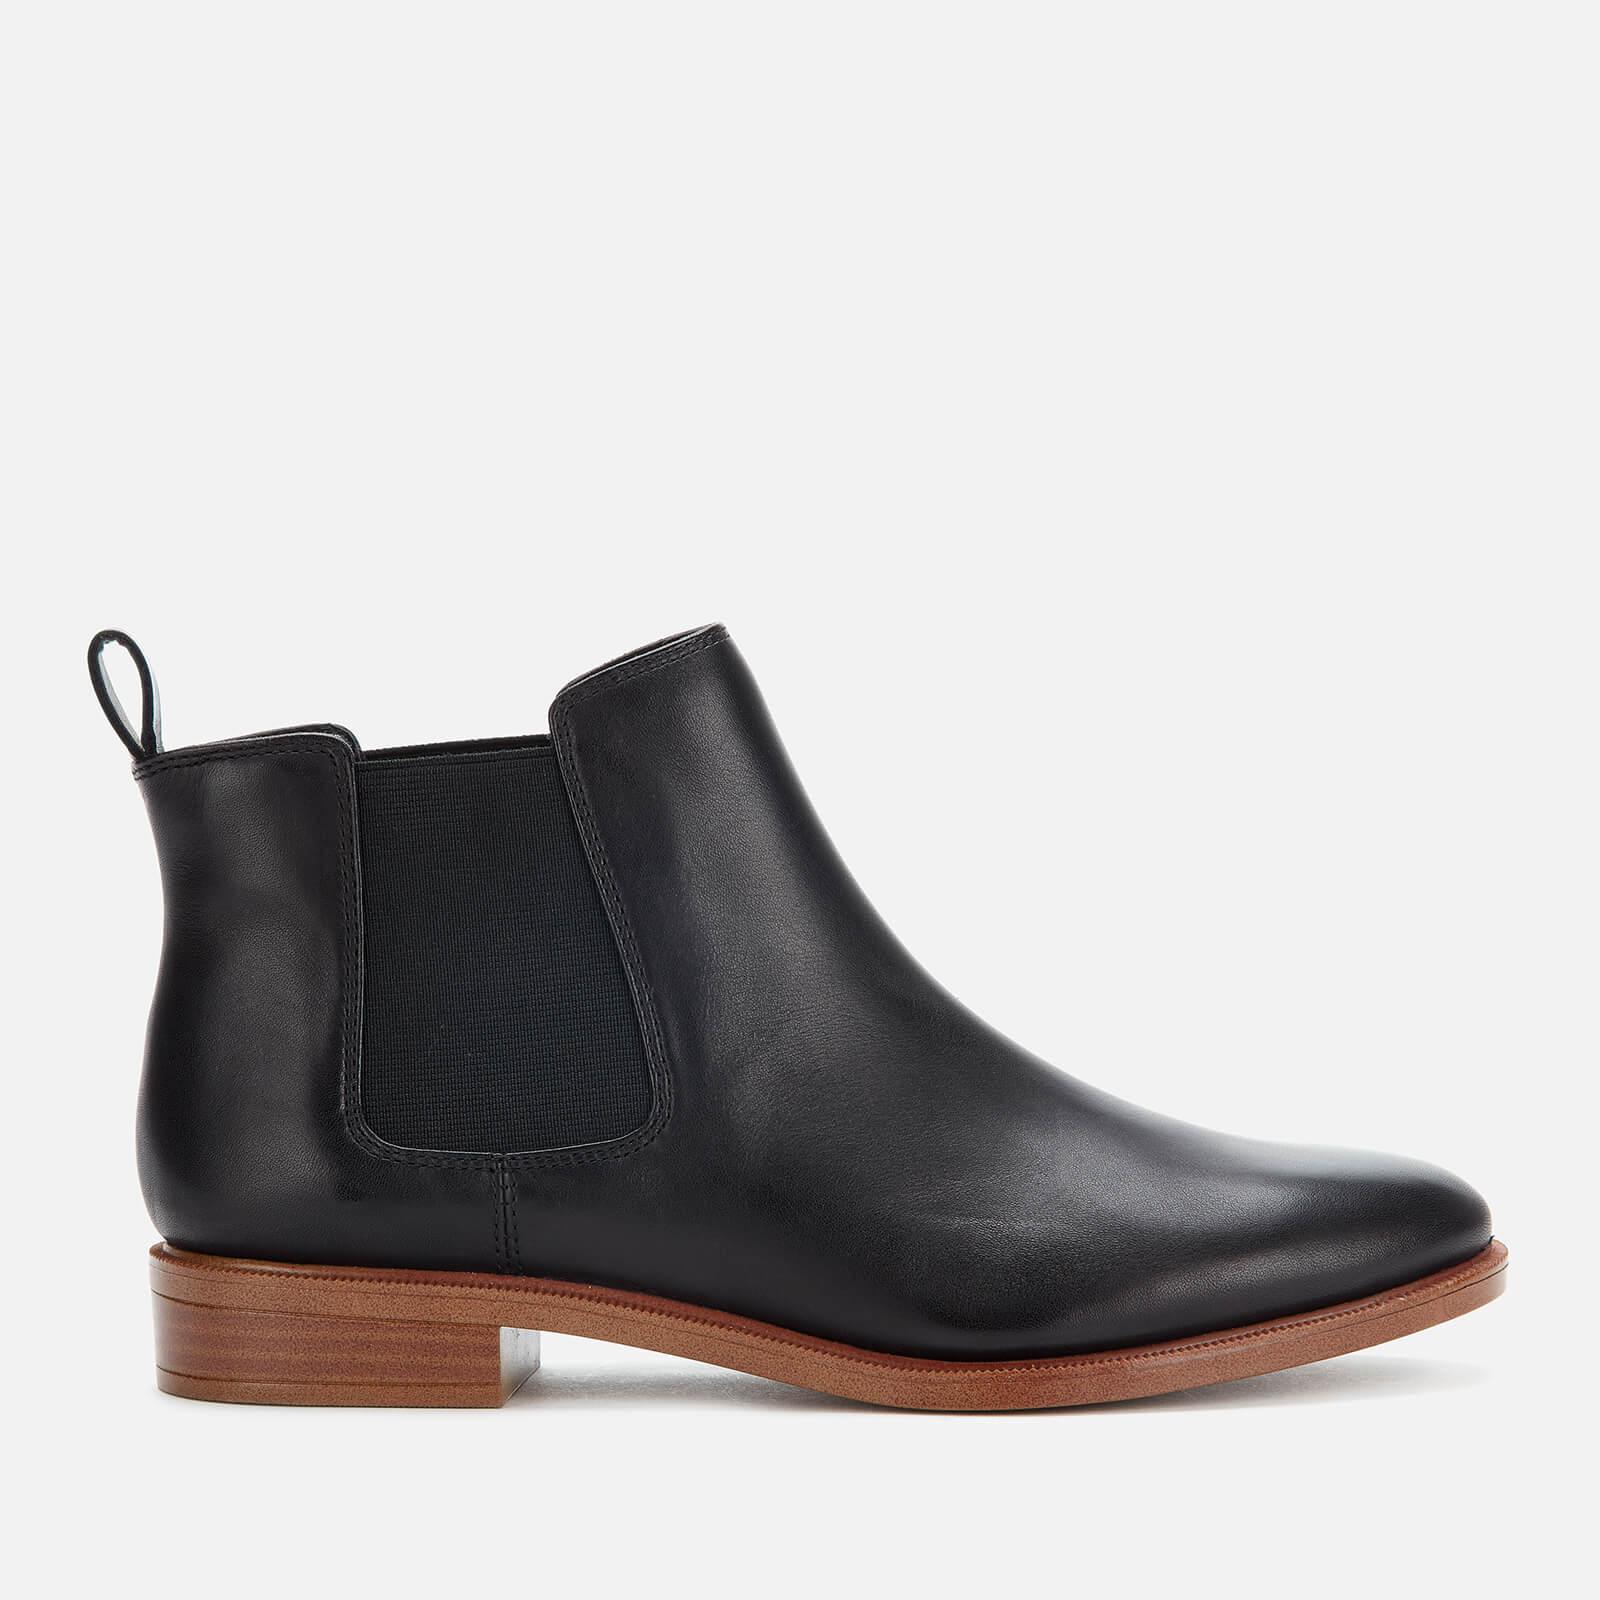 Clarks Women's Taylor Shine Leather Chelsea Boots - Black - UK 7